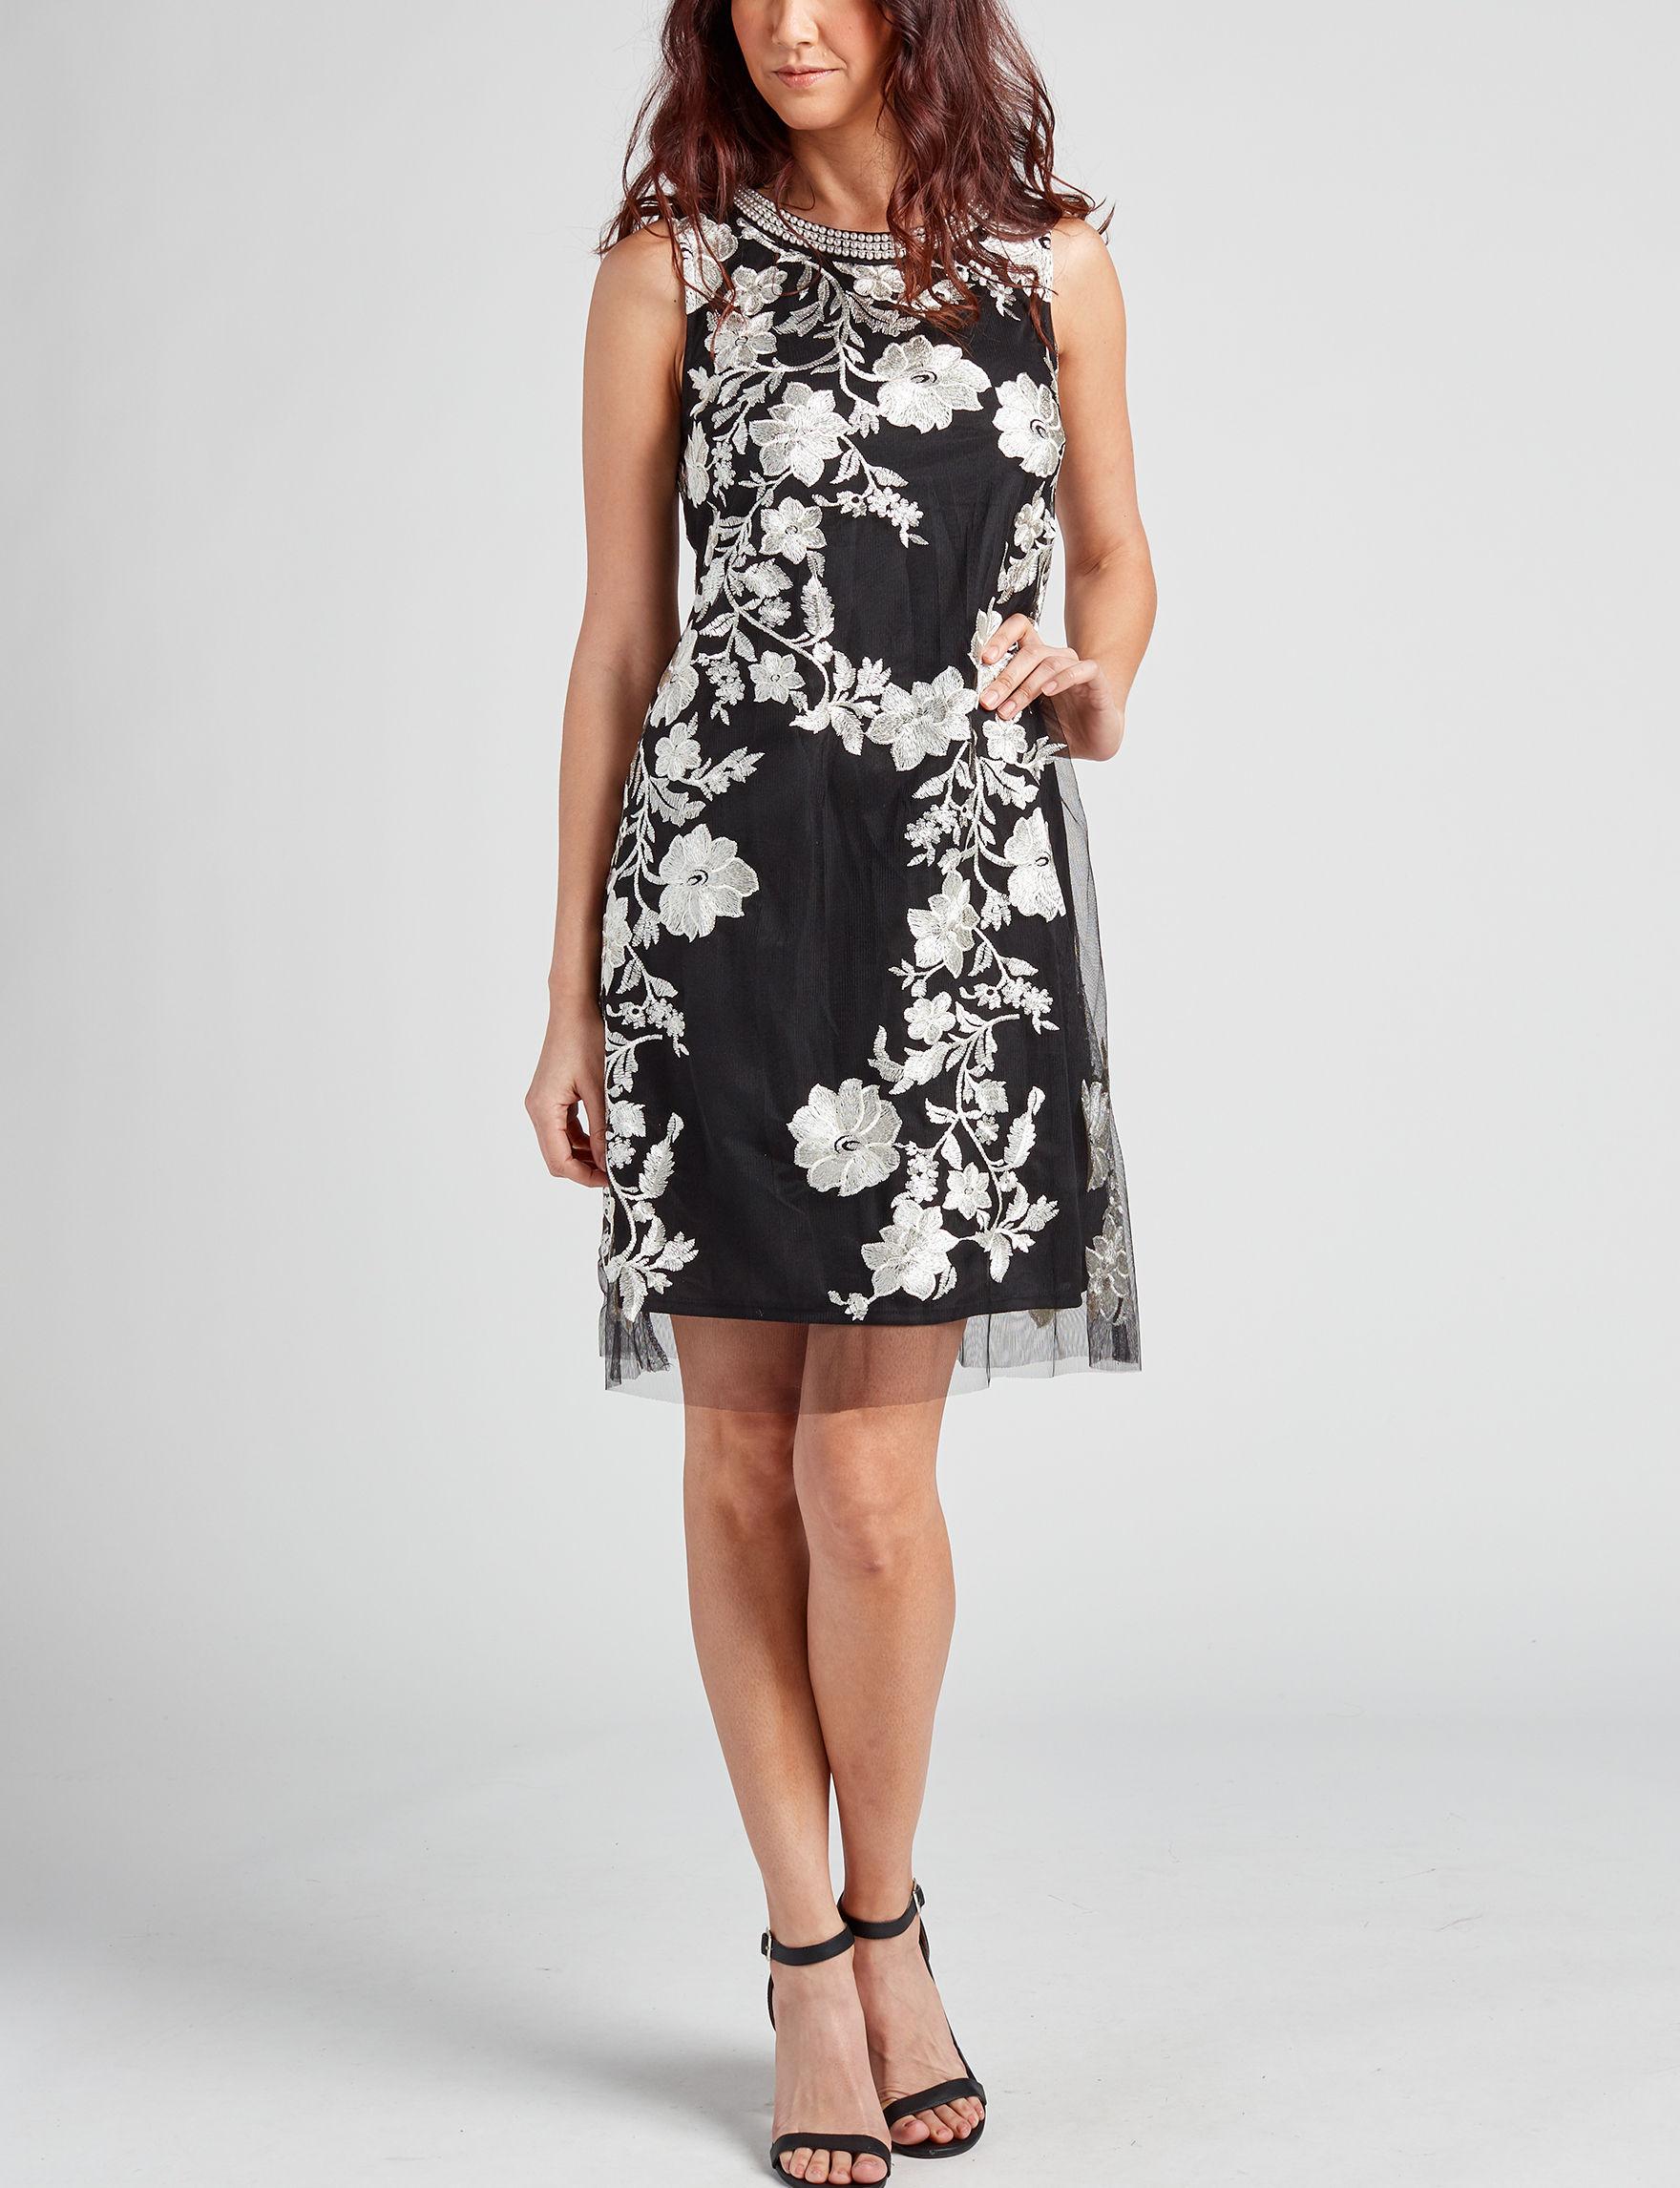 Sandra Darren Black / Ivory Shift Dresses